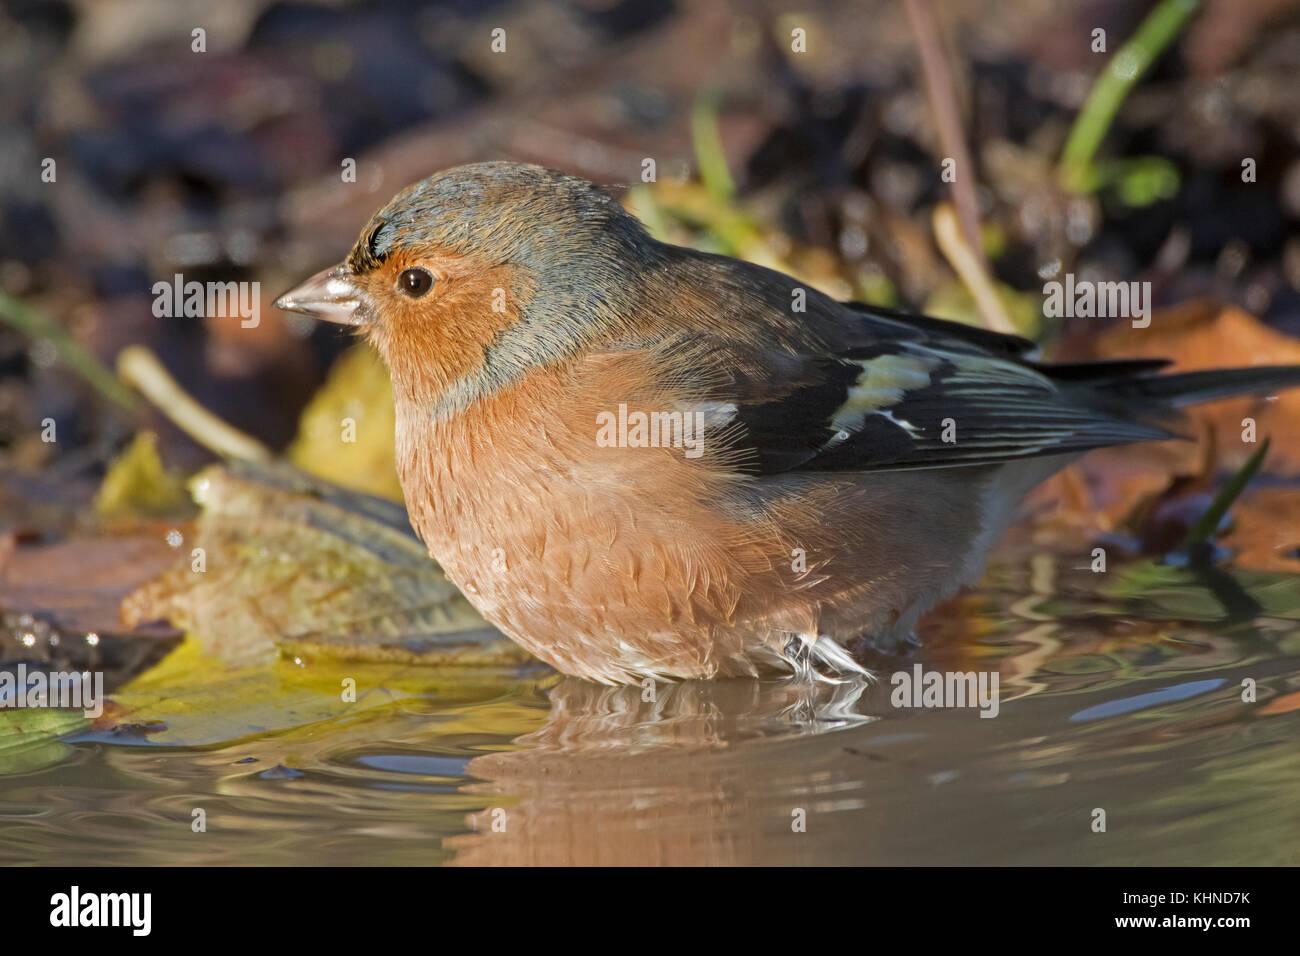 Male chaffinch Fringilla coelets bathing in puddle - Stock Image